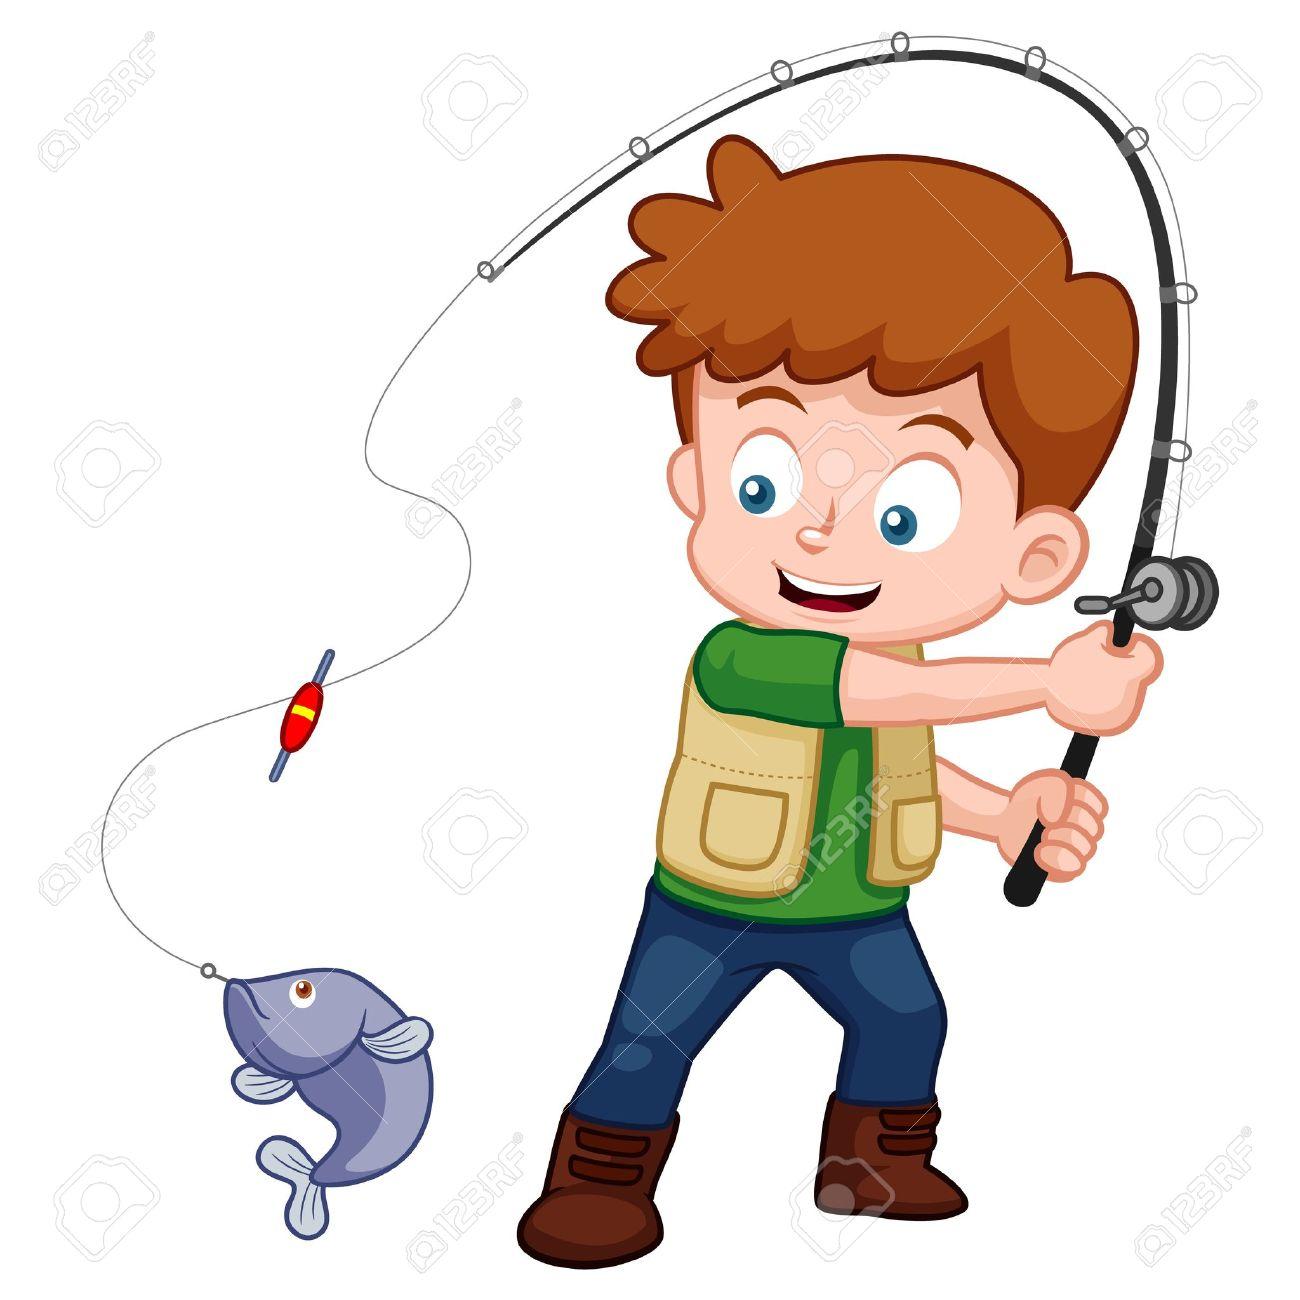 Illustration Of Cartoon Boy Fishing Royalty Free Cliparts Vectors - Cartoon-boy-images-free